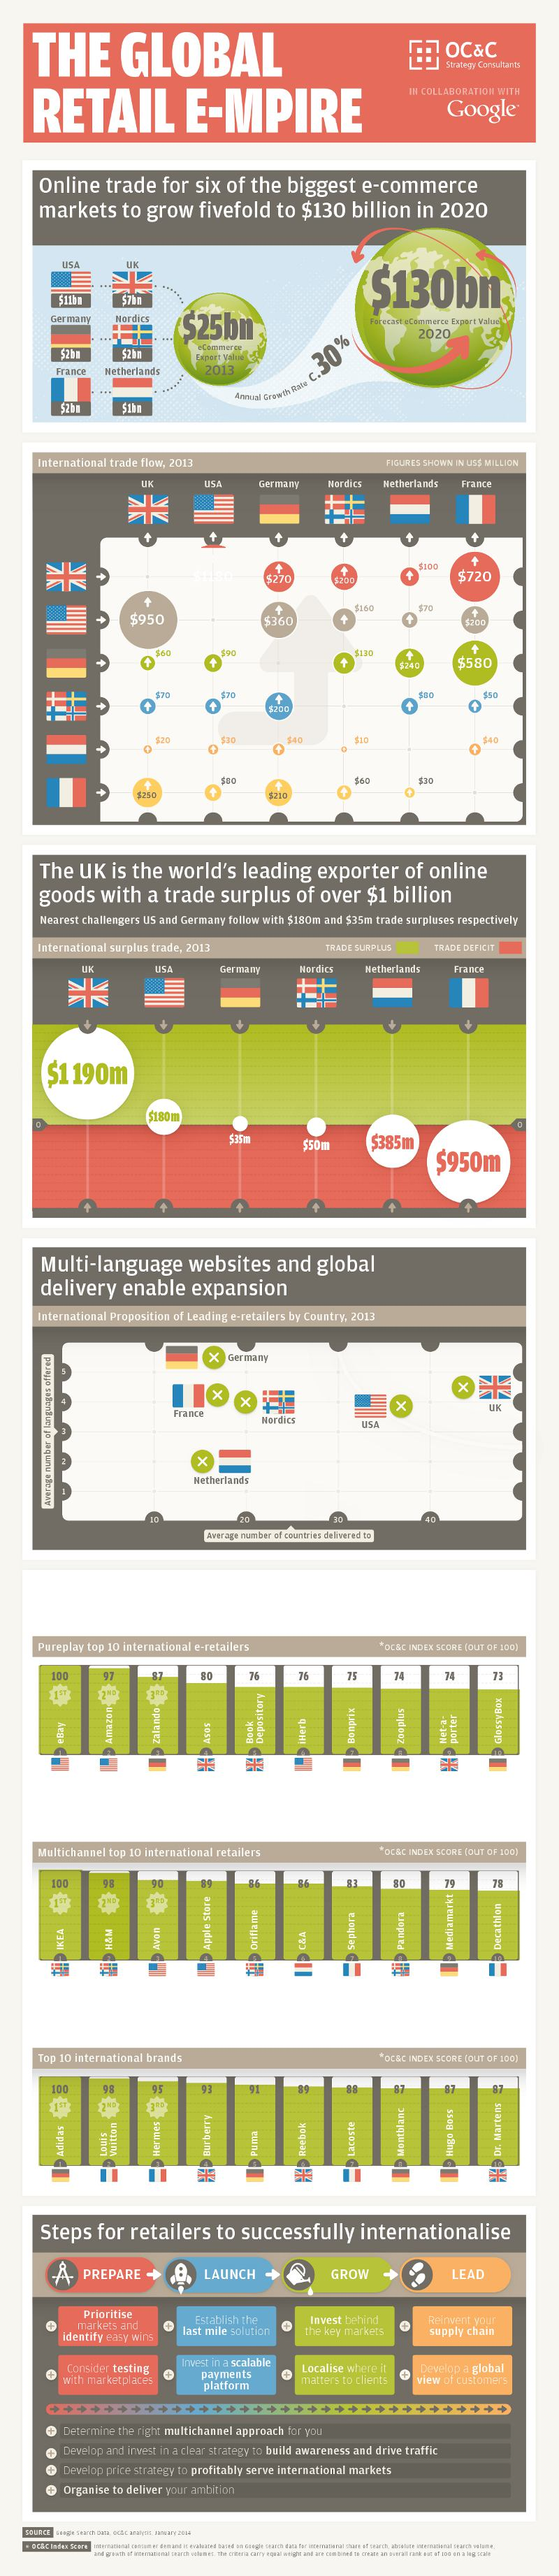 global_retail_e-mpire_infographic